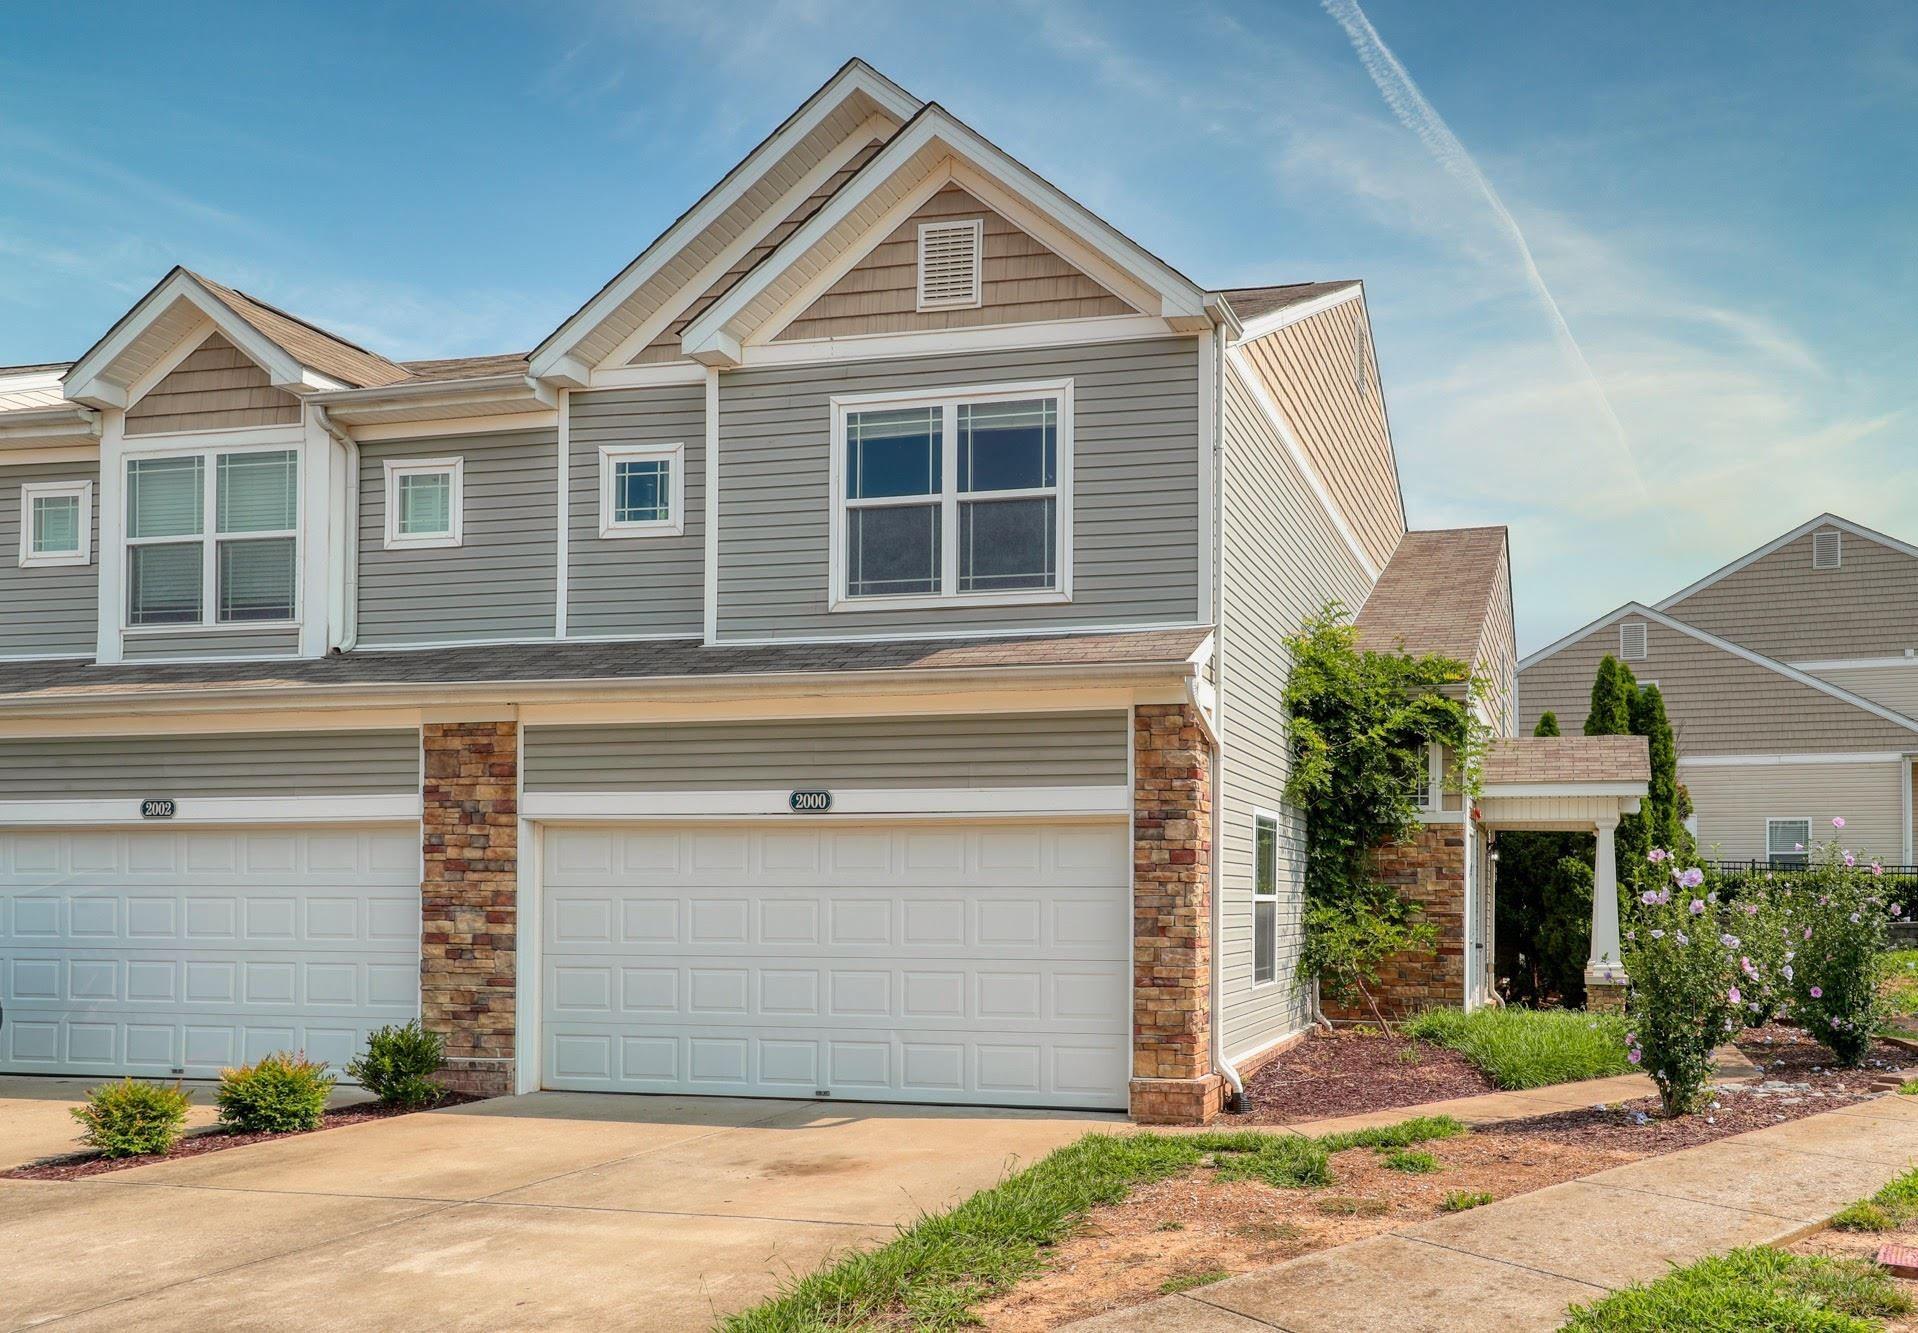 2000 Lavender Ct, Spring Hill, TN 37174 - MLS#: 2274550